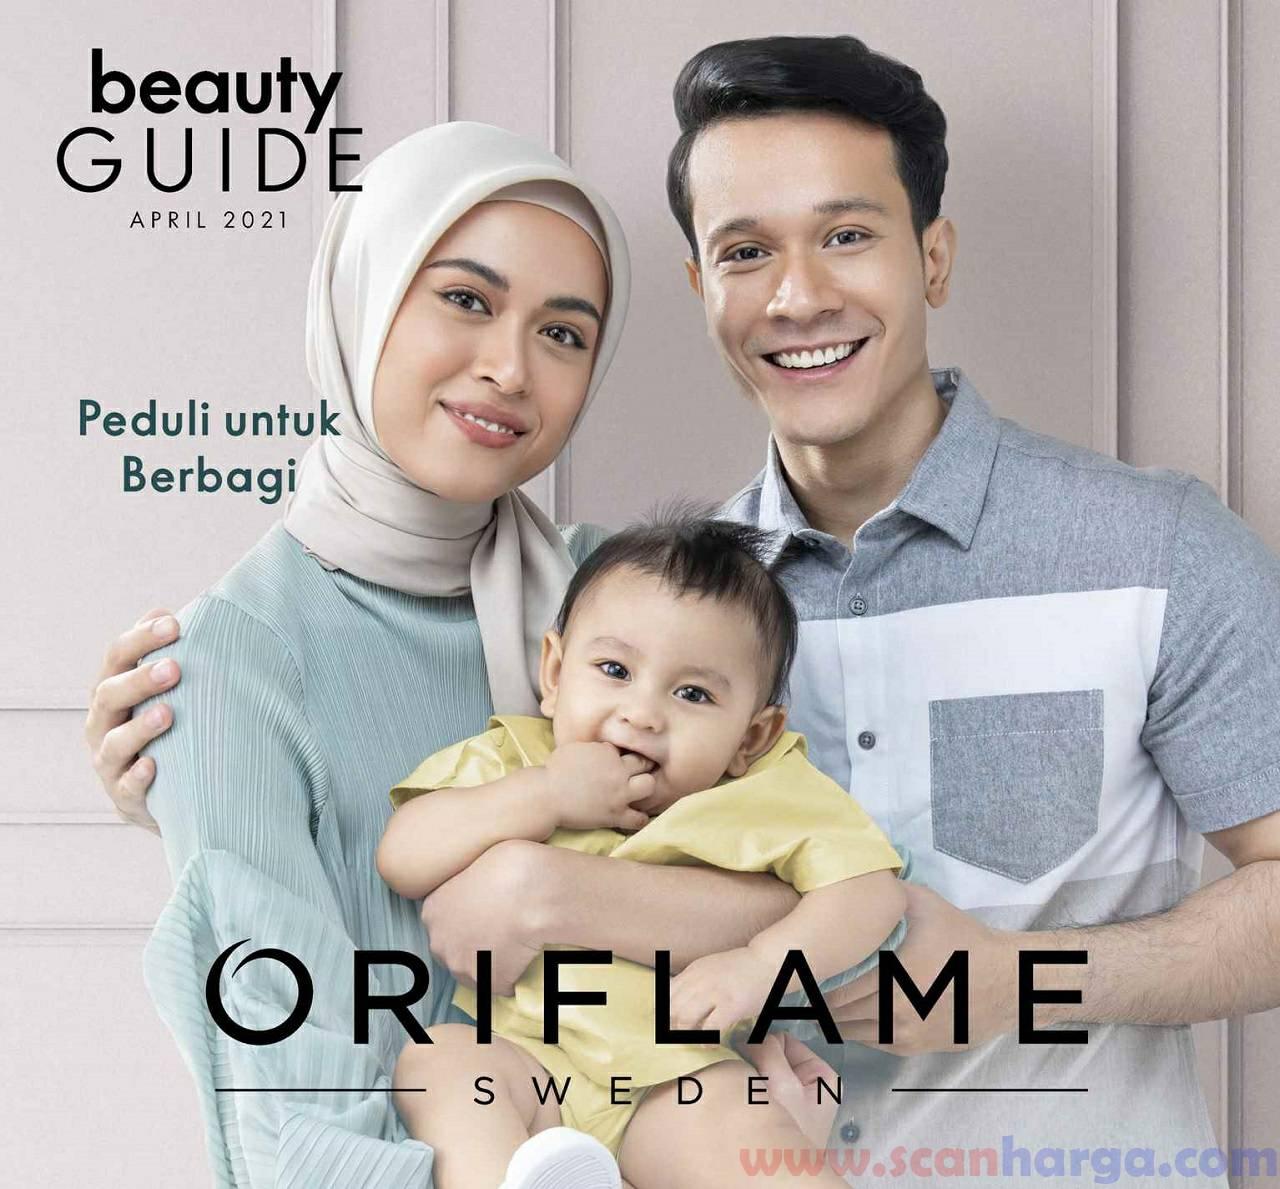 Katalog Oriflame Promo Brosur April 2021